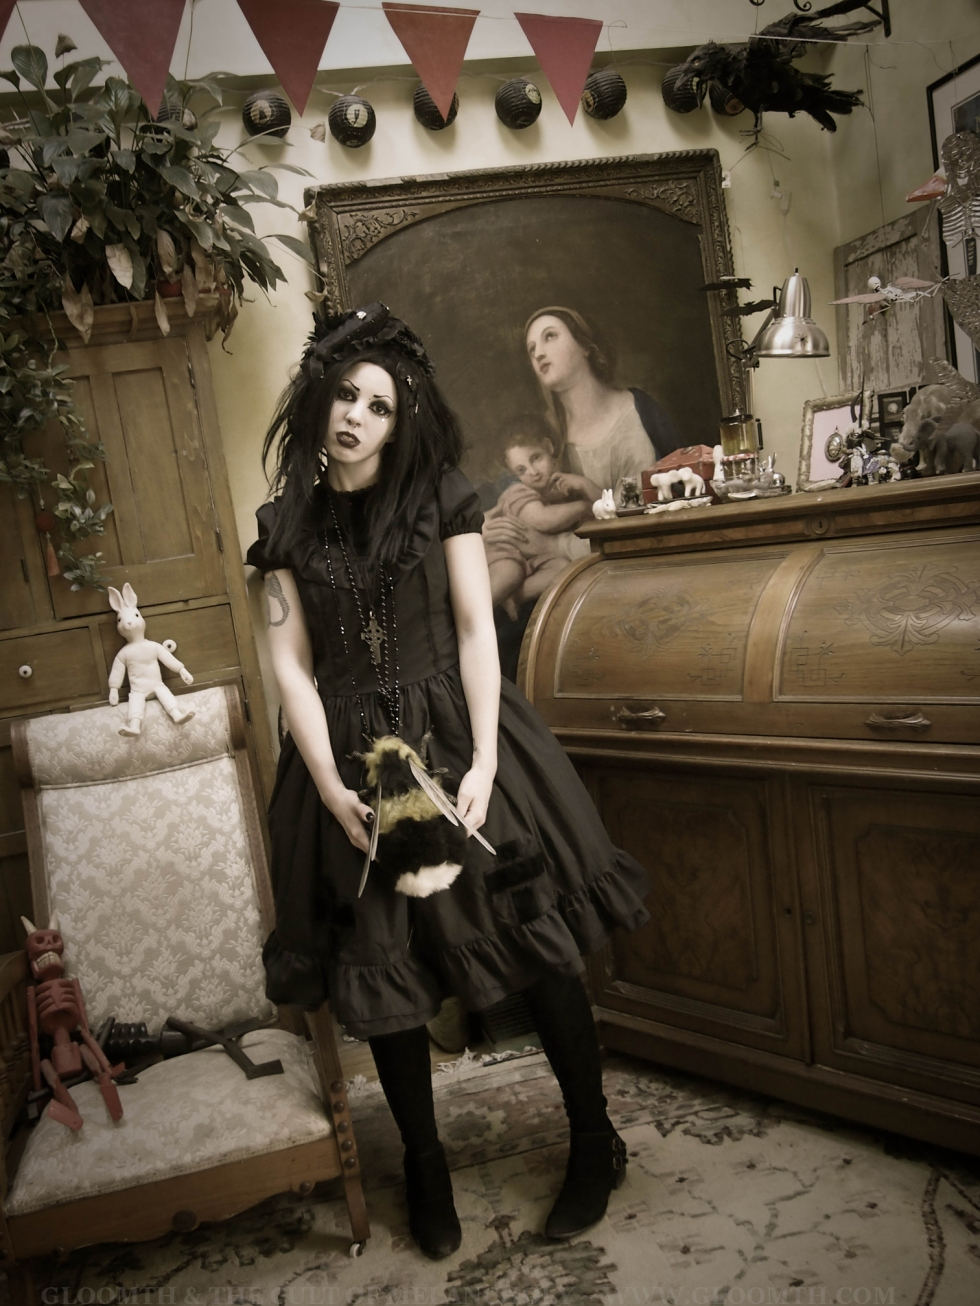 gothic antique doll creepy room